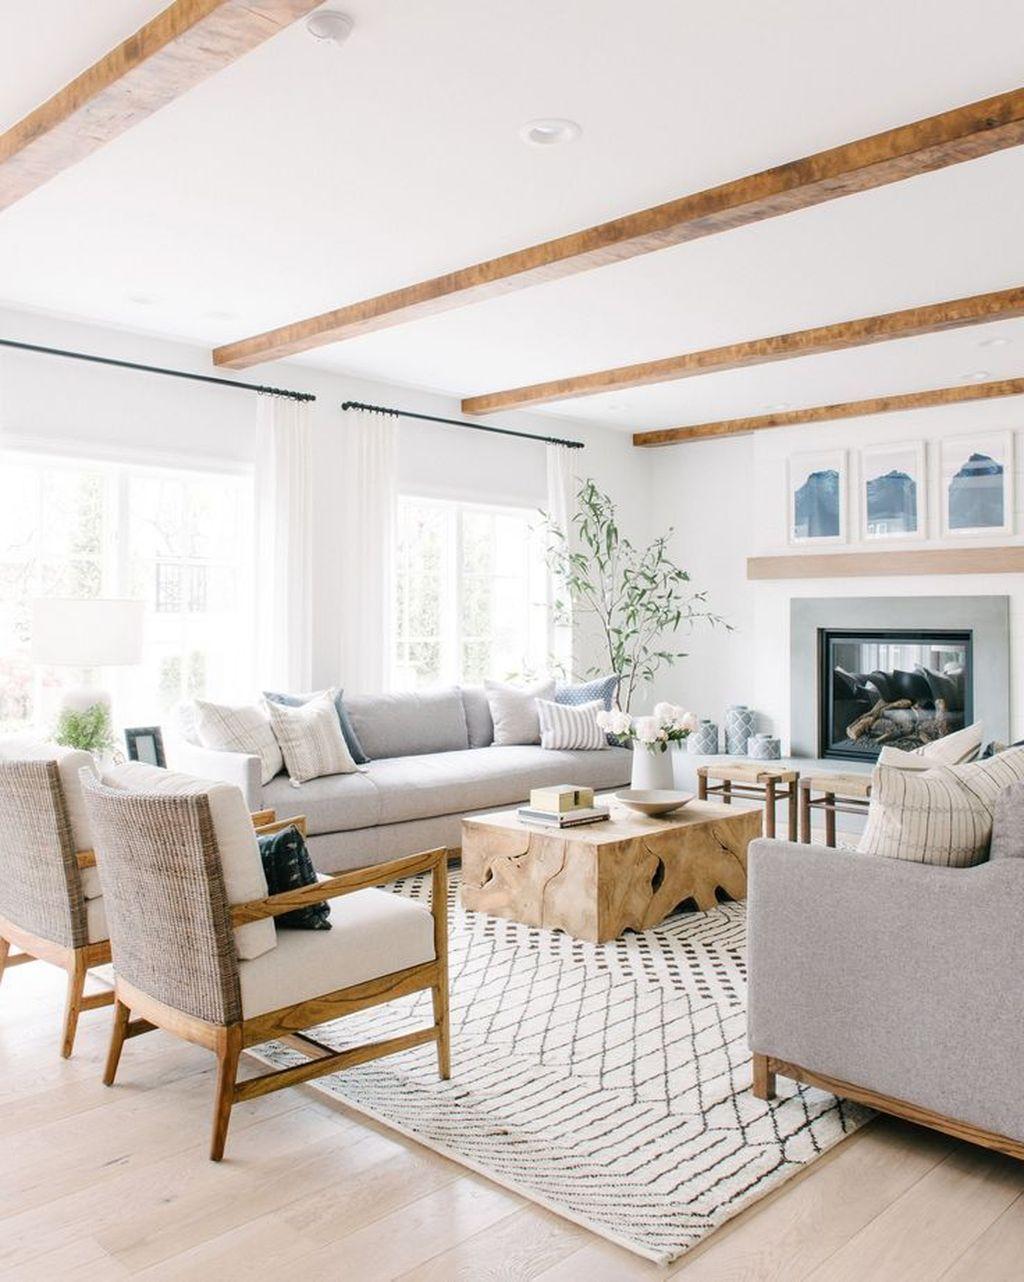 Excellent Furniture Design Ideas For Your Living Room 14